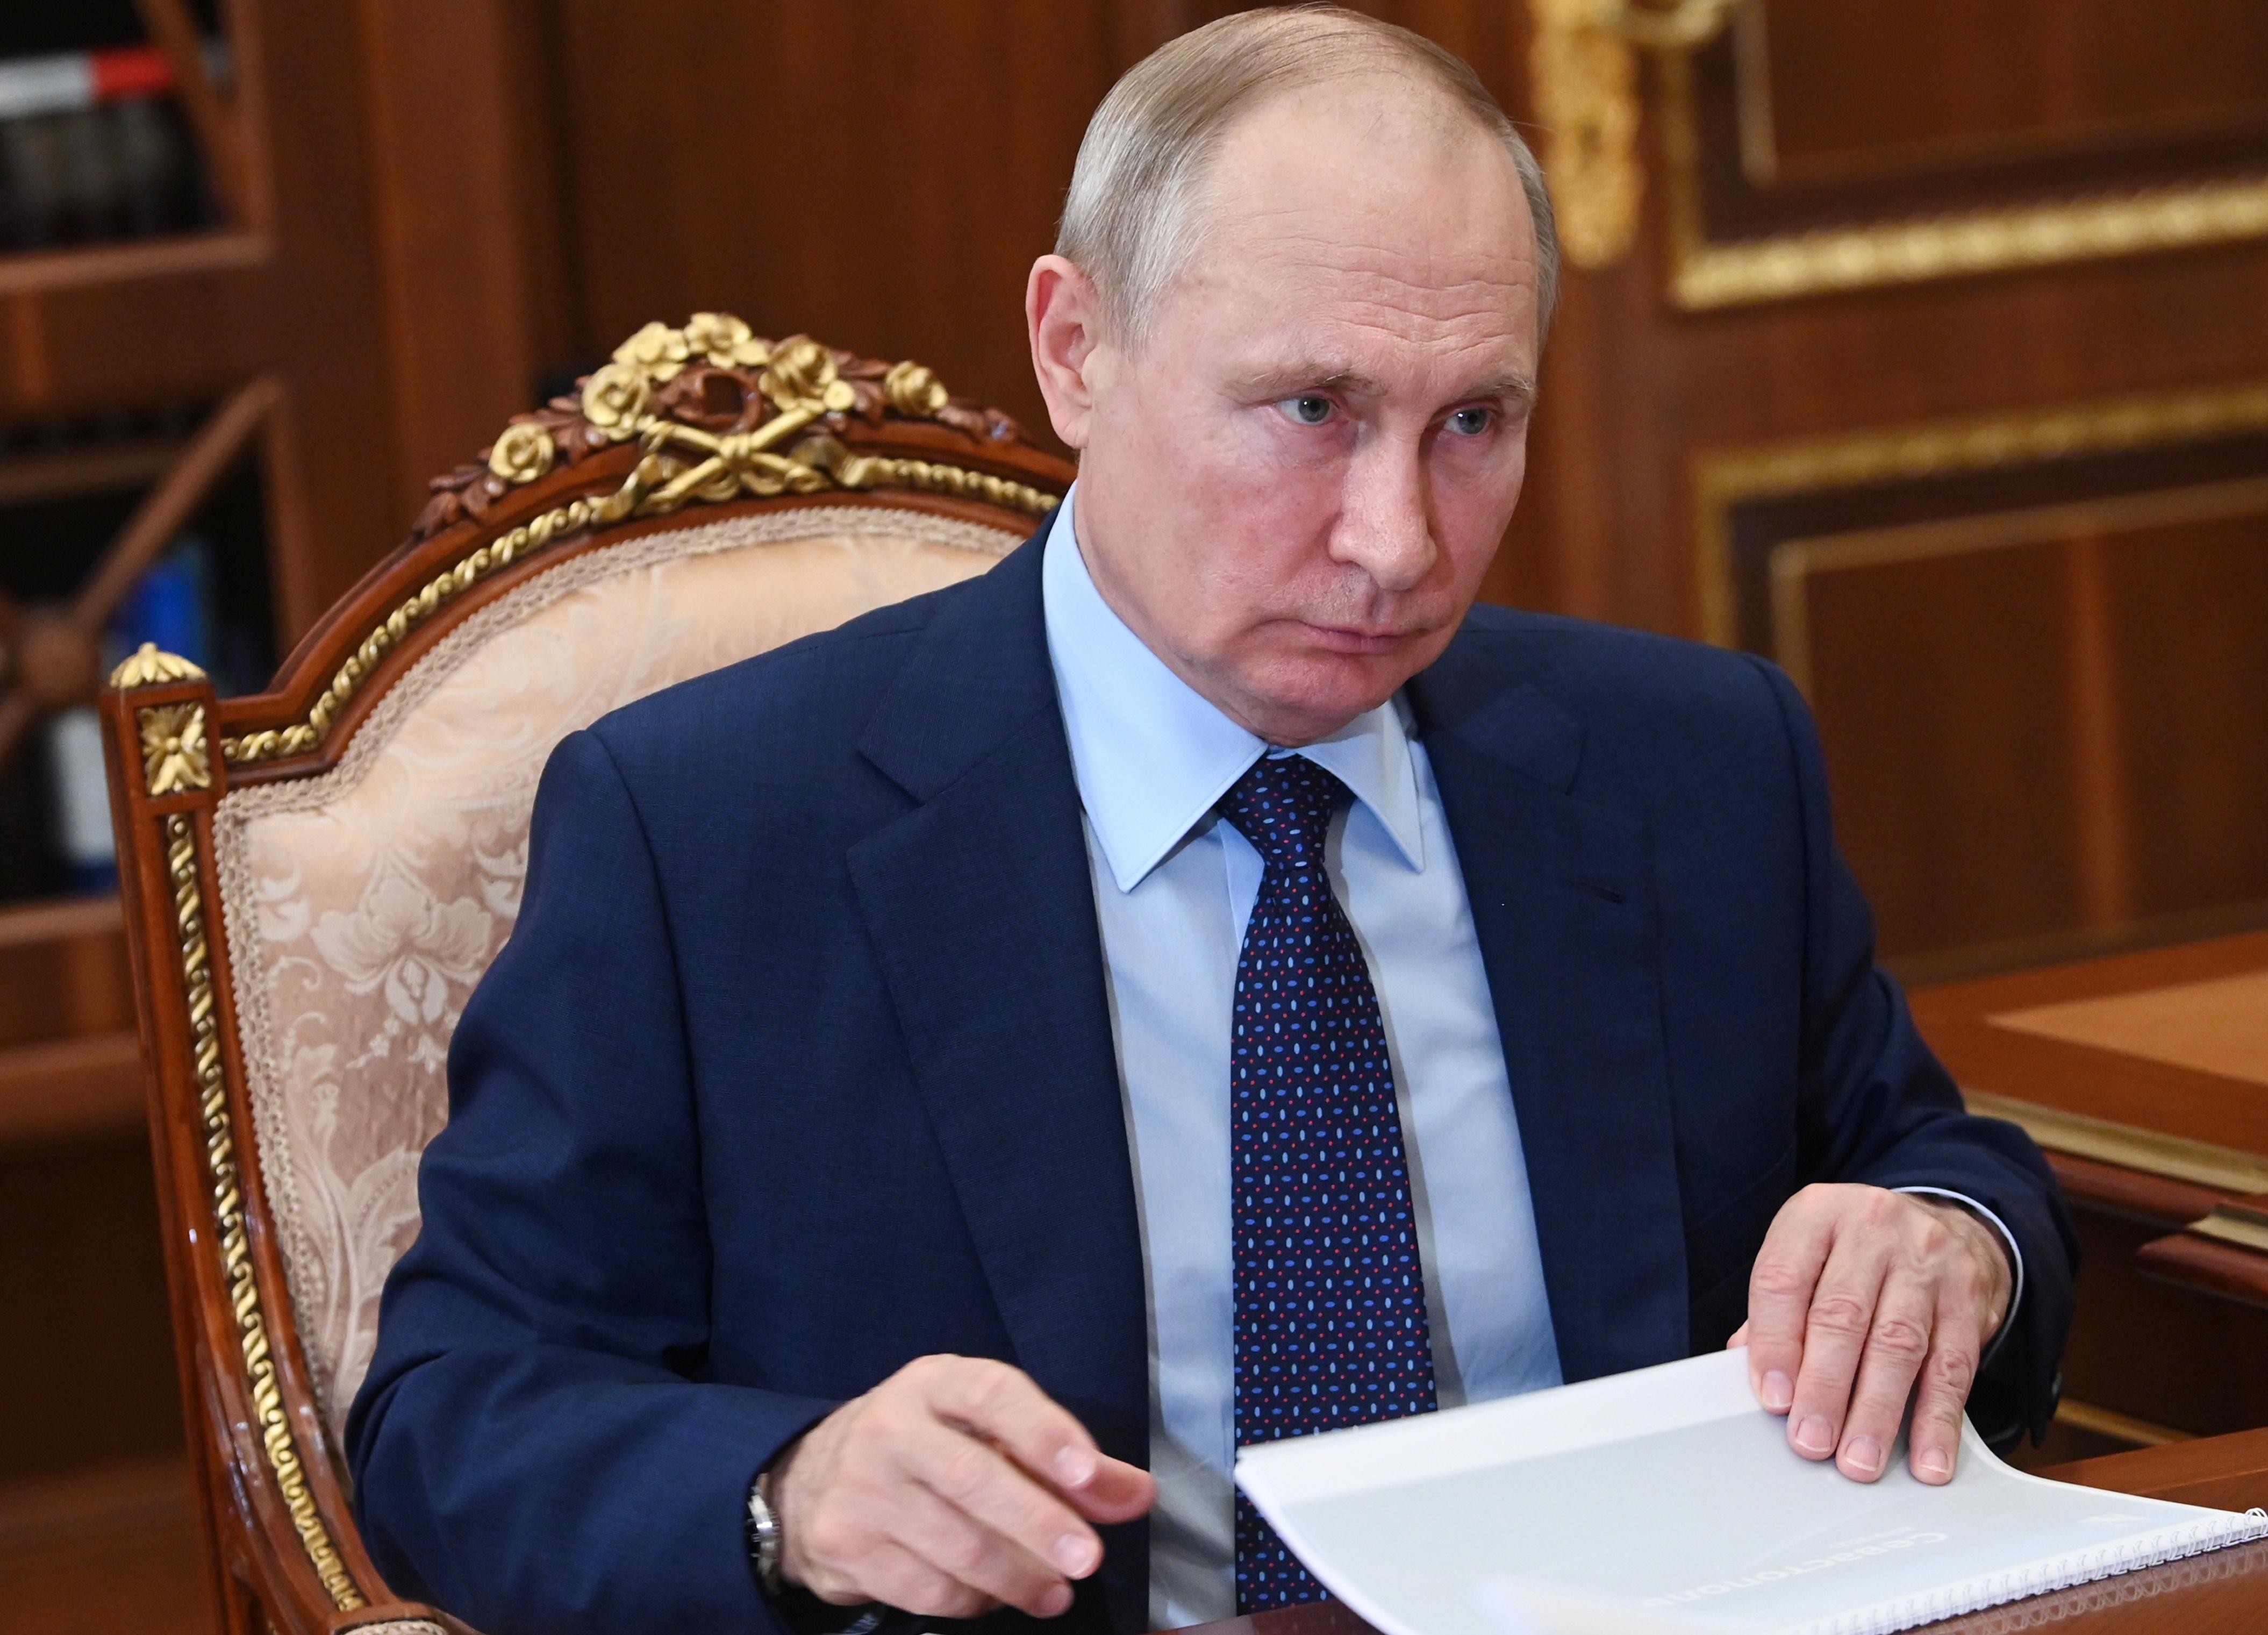 Russian President Vladimir Putin attends a meeting with Governor of Sevastopol Mikhail Razvozhayev at the Kremlin in Moscow, Russia August 11, 2021. Sputnik/Alexei Nikolsky/Kremlin via REUTERS